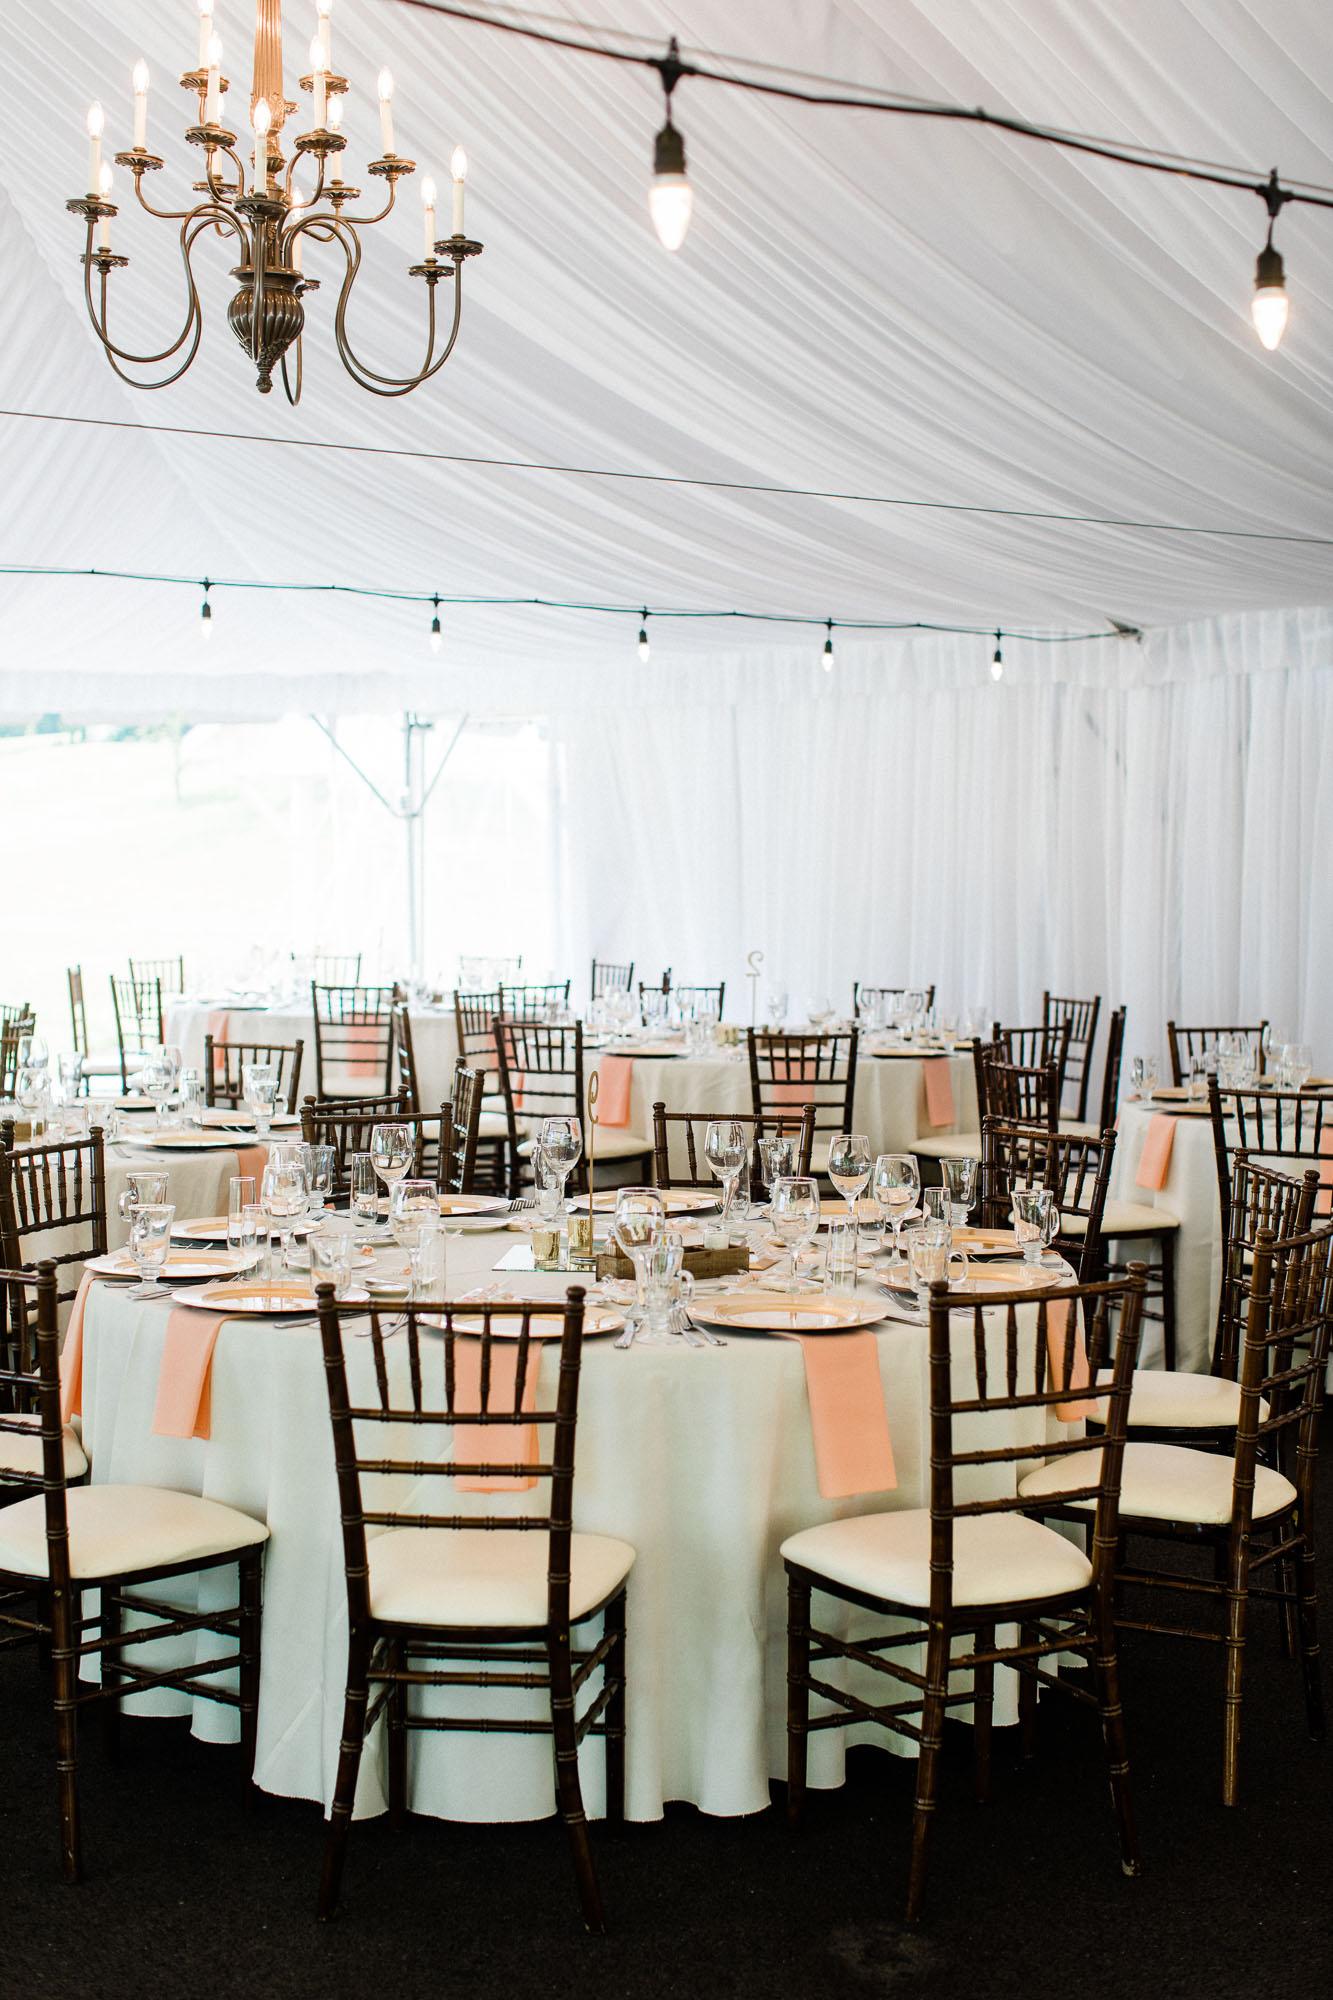 Allenberry-resort-historic-pennsylvania-wedding-21763.jpg